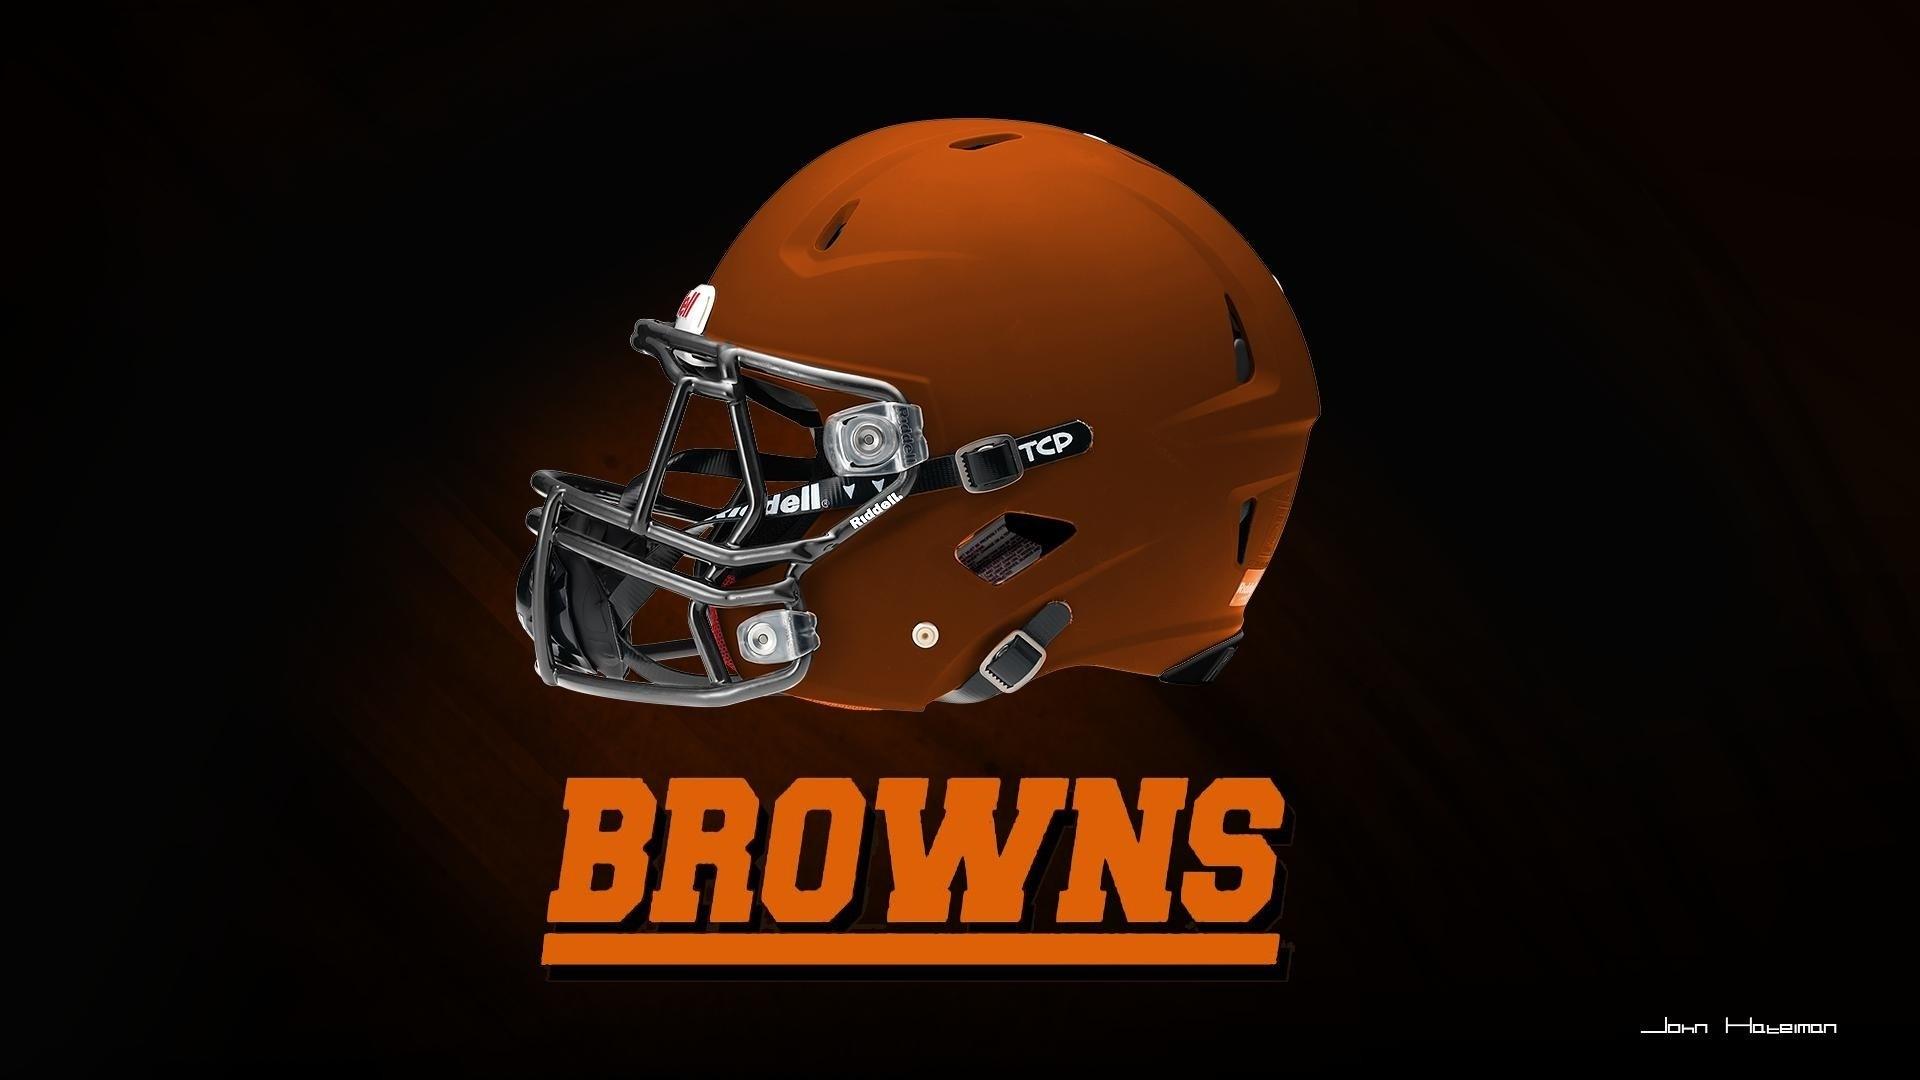 Cleveland Browns Background Wallpaper